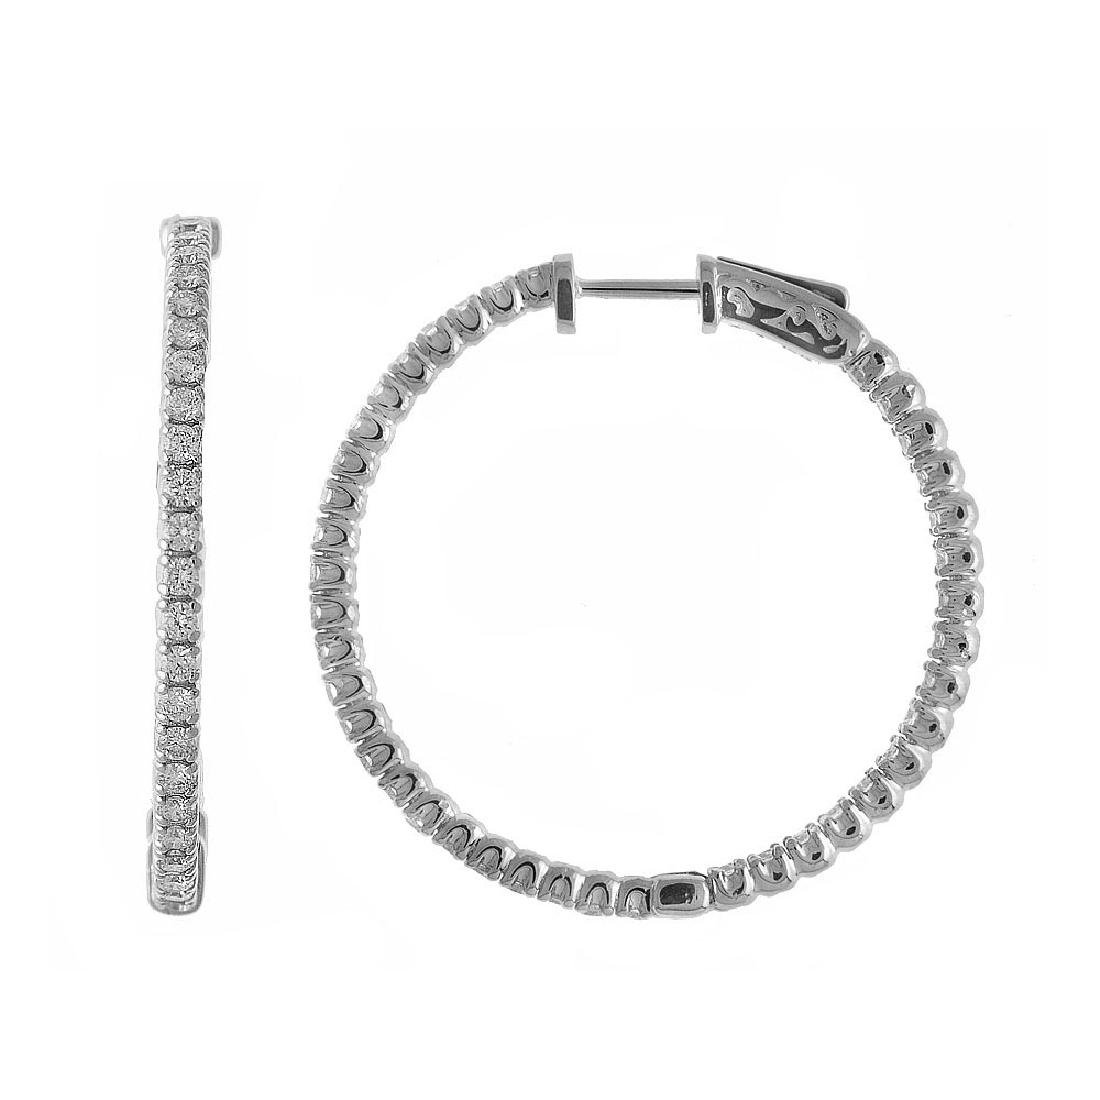 Certified 14K 3ct White Gold Diamond Secure Lock 35 mm